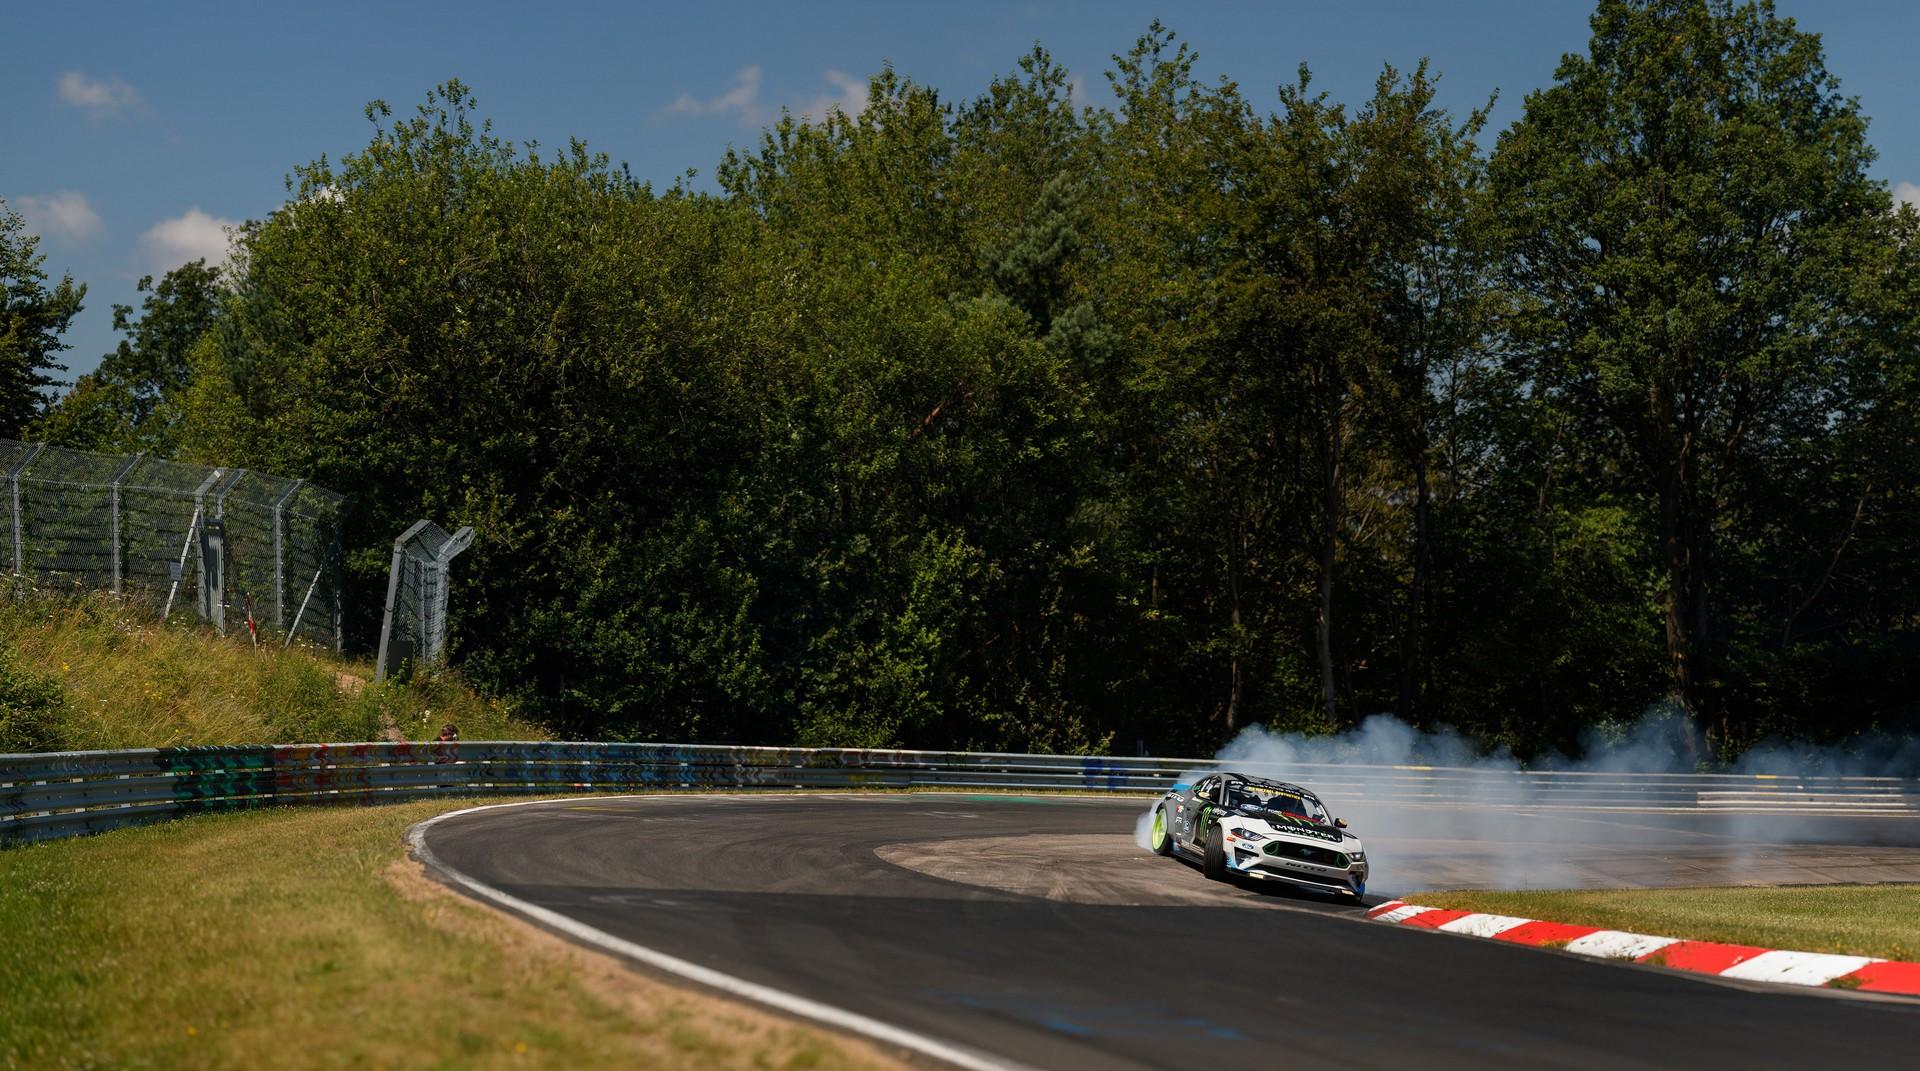 Ford_Mustang_RTR_Nurburgring_0002